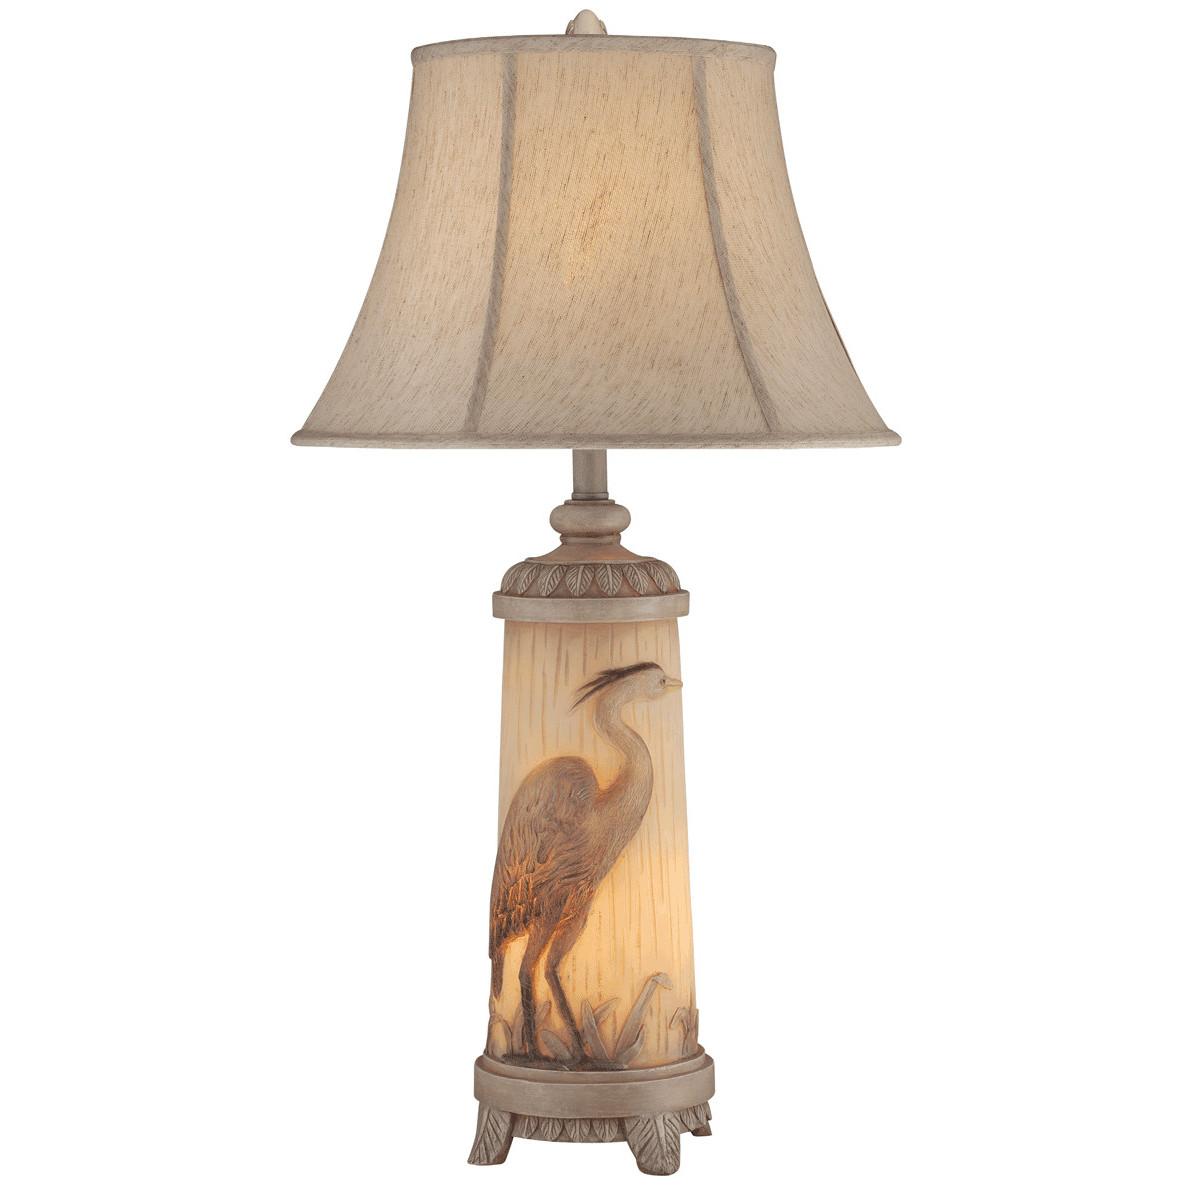 Heron Night Light Table Lamp